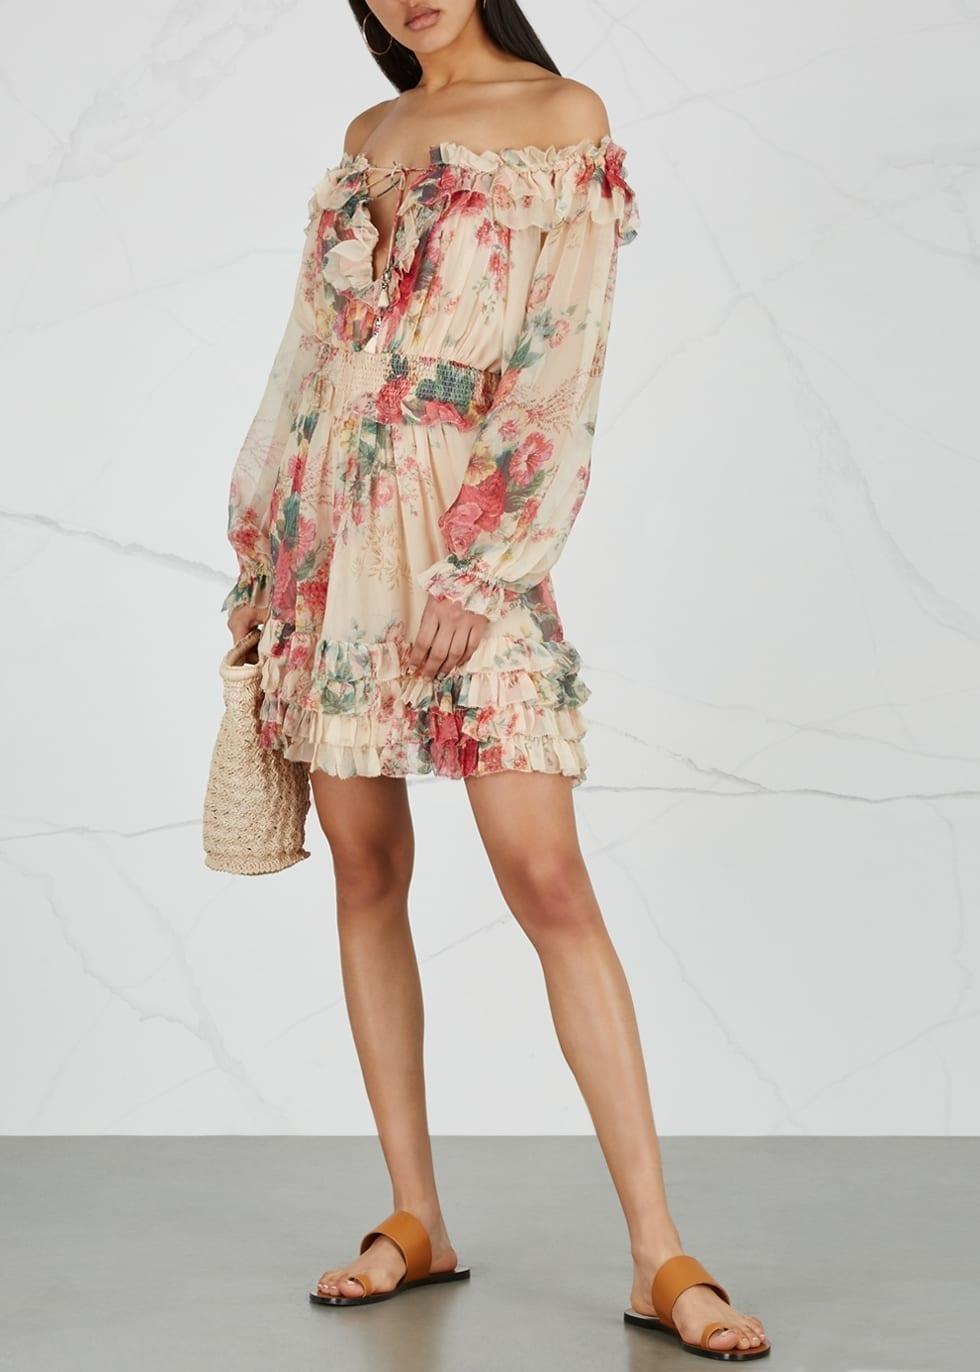 ZIMMERMANN Laelia Meadows Chiffon Floral Printed Dress